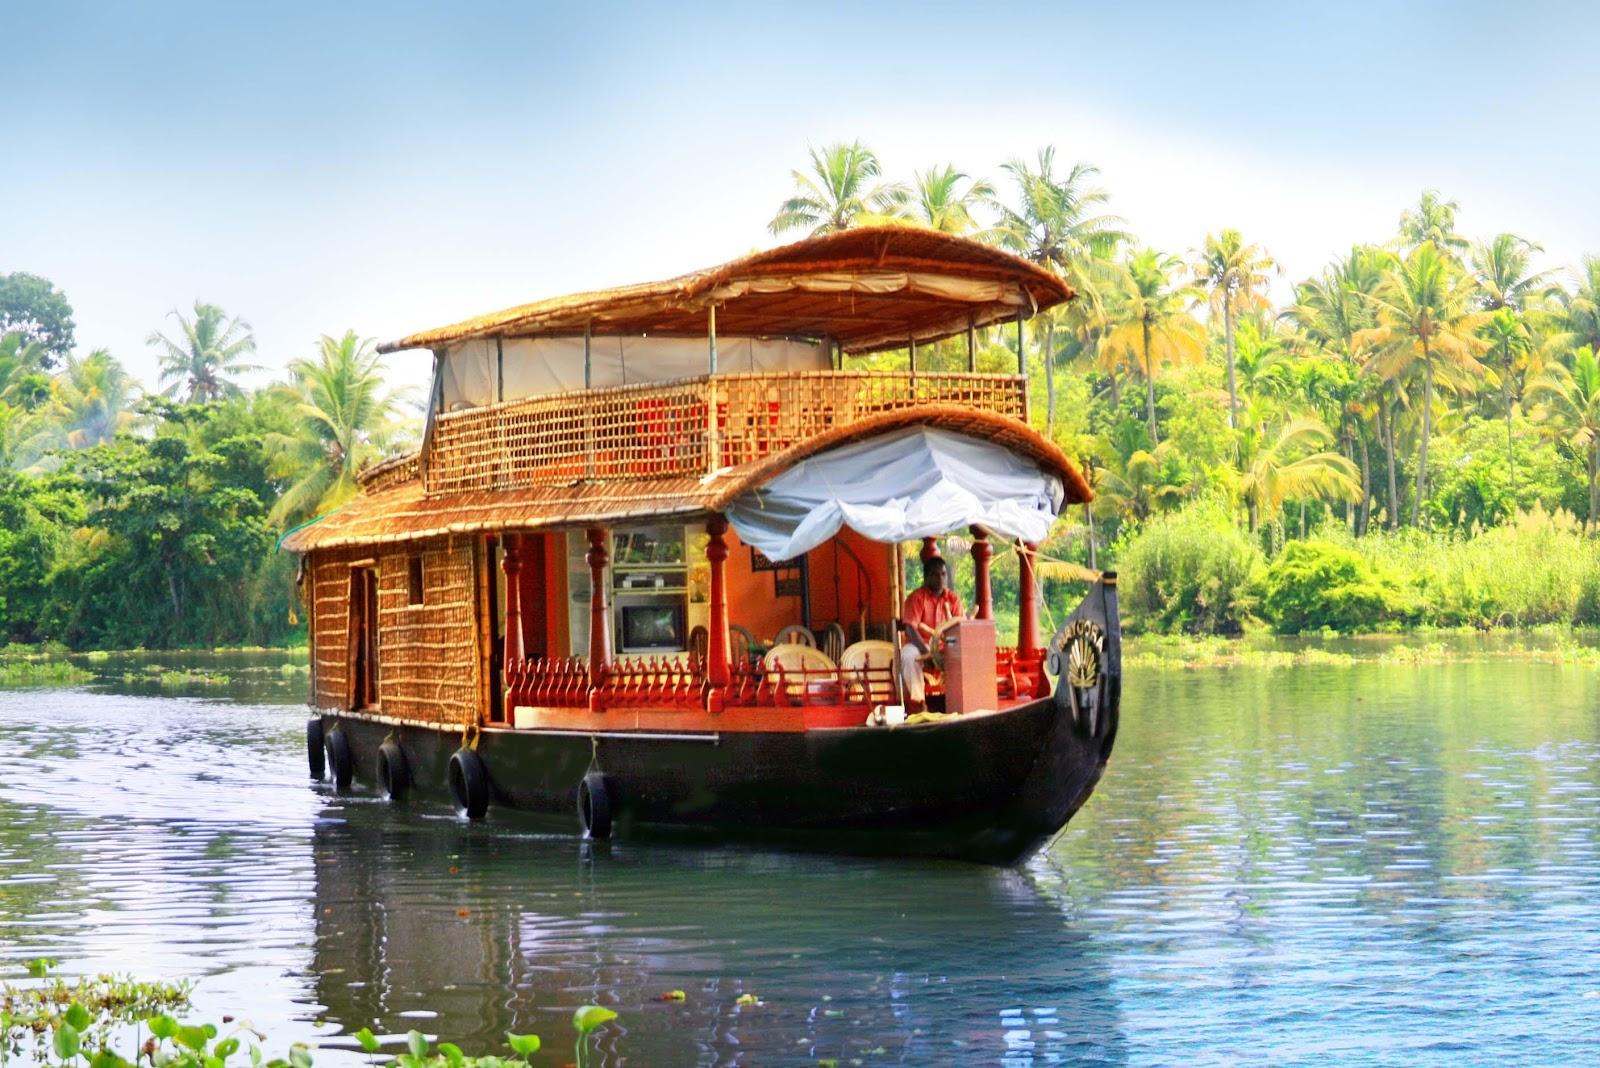 http://www.media4news.com/wp-content/uploads/2014/09/backwaters-in-Kerala.jpg